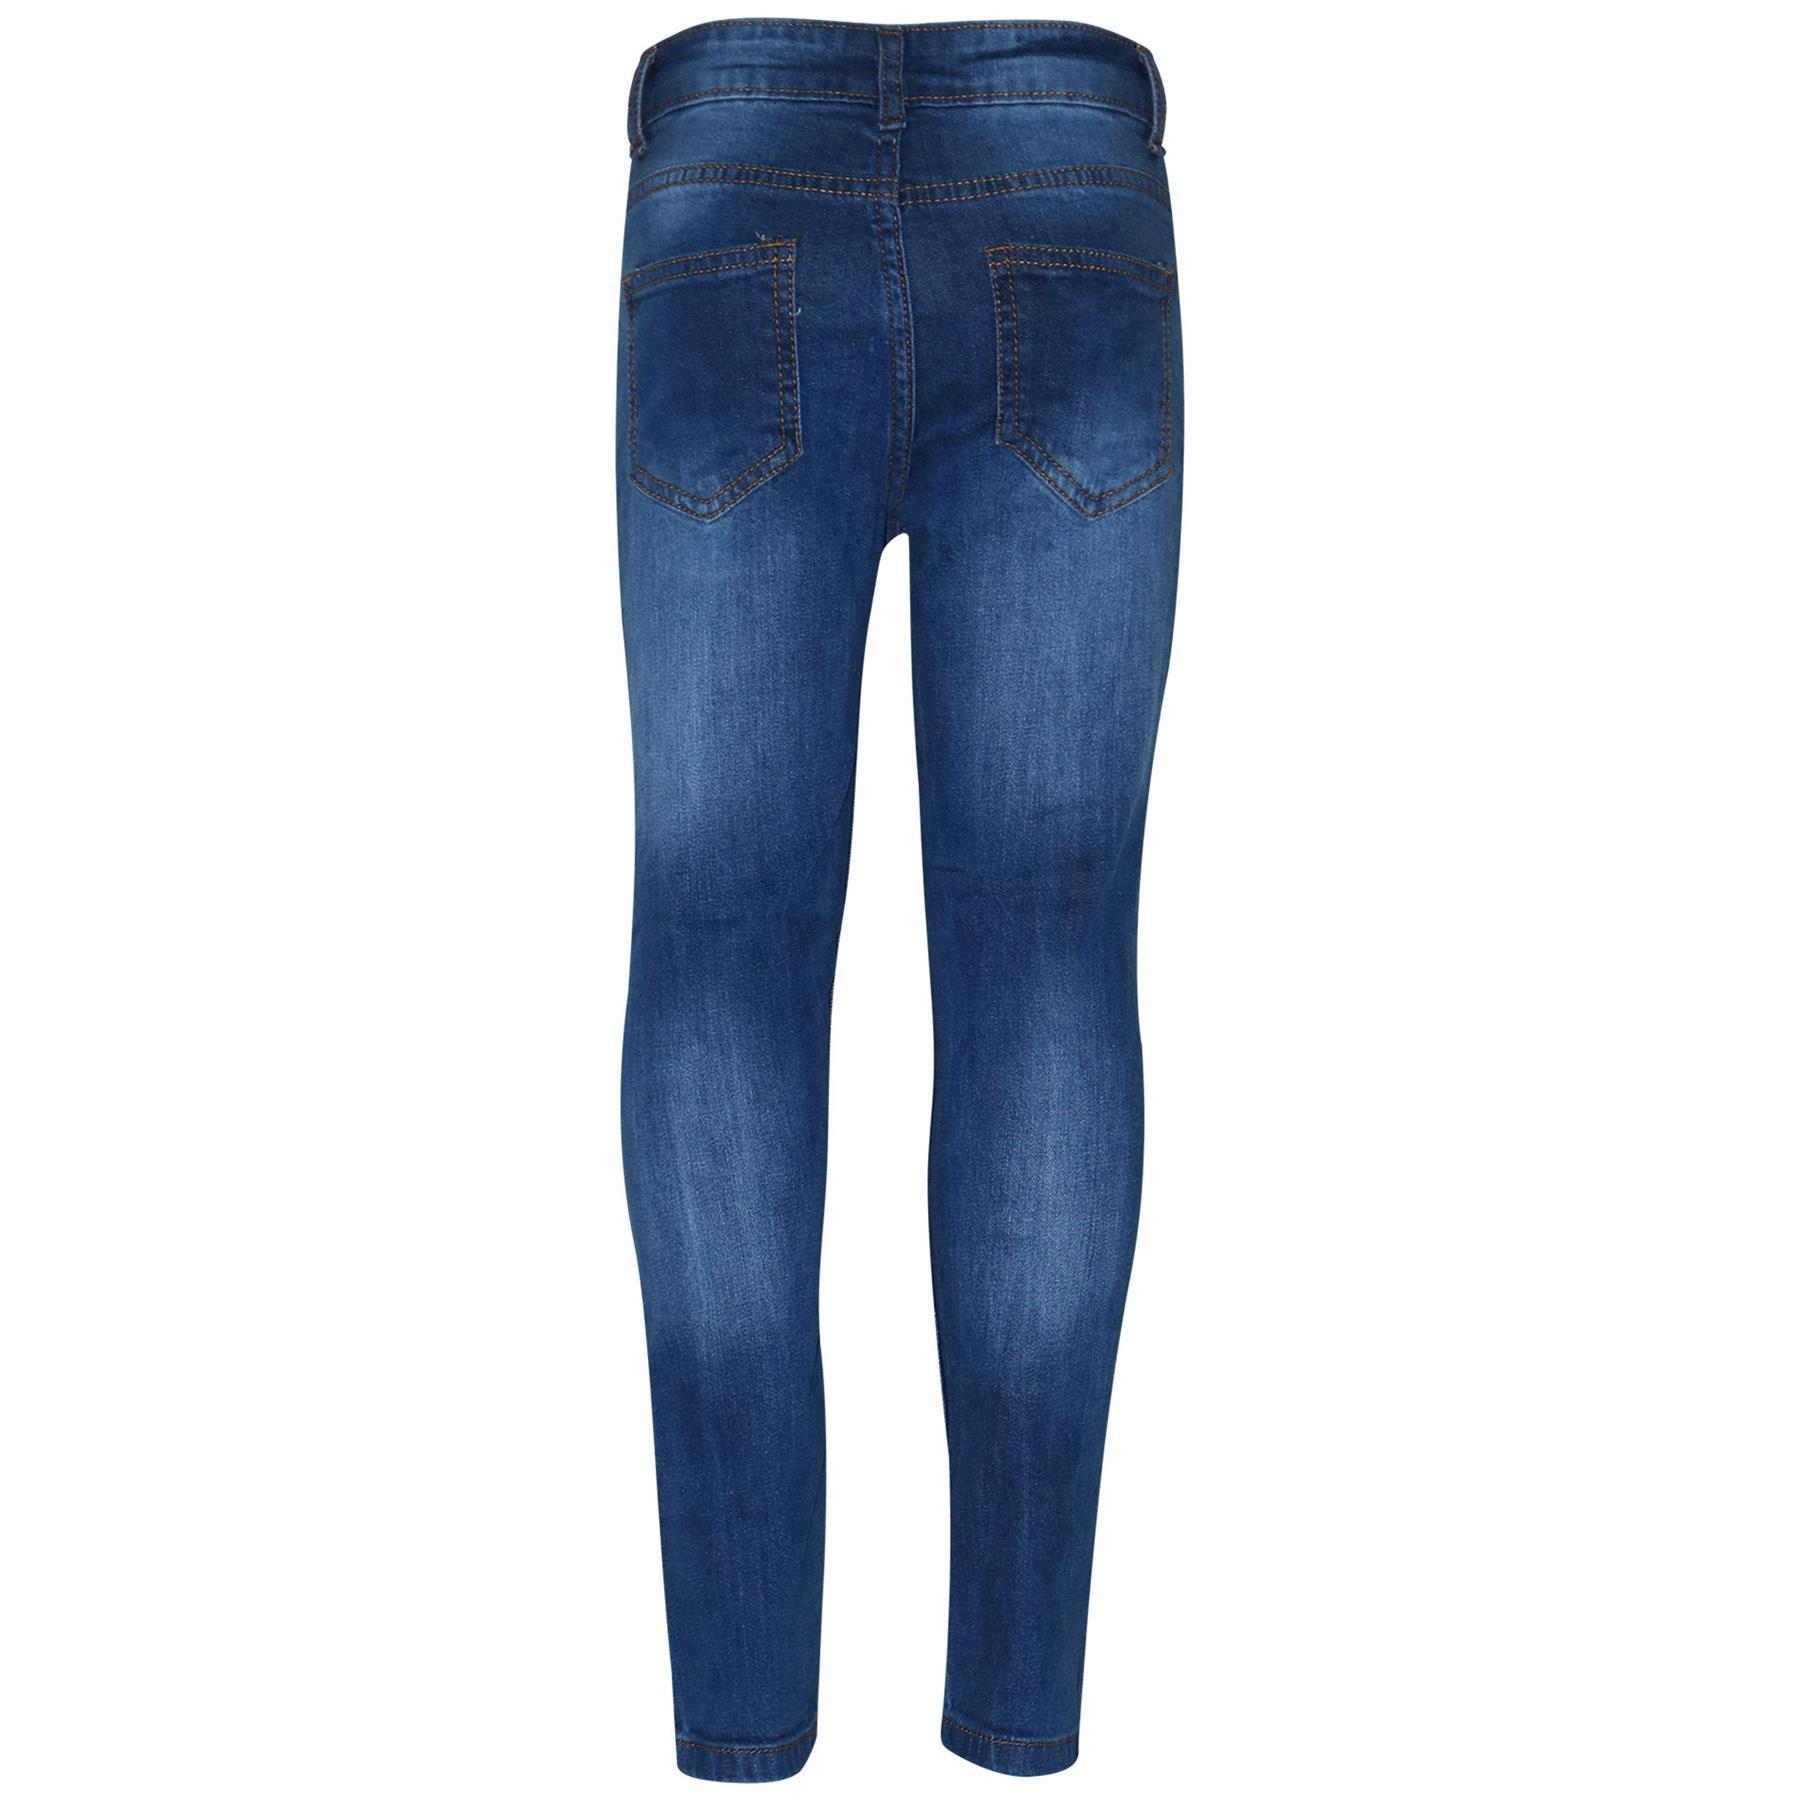 Kids Boys Skinny Jeans Denim Knee Ripped Slim Stretchy Bikers Pants Trouser 5-13